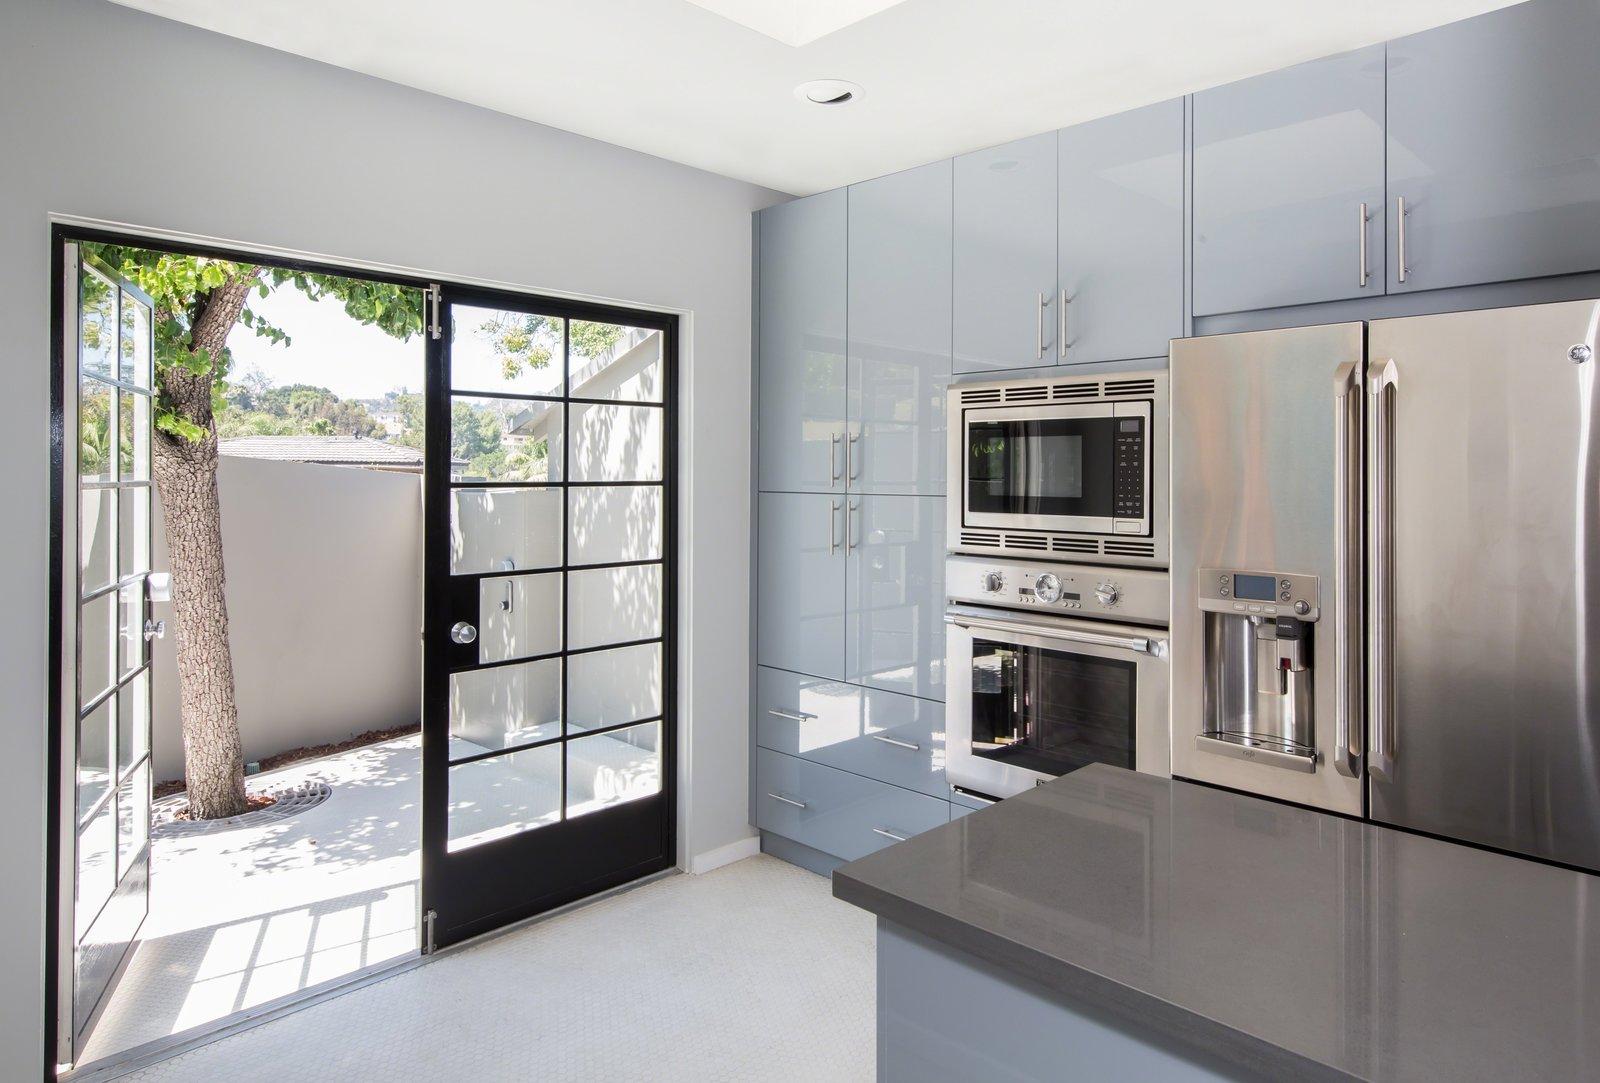 Kitchen, Refrigerator, Laminate, Wall Oven, and Laminate  Best Kitchen Laminate Laminate Photos from Lake Hollywood